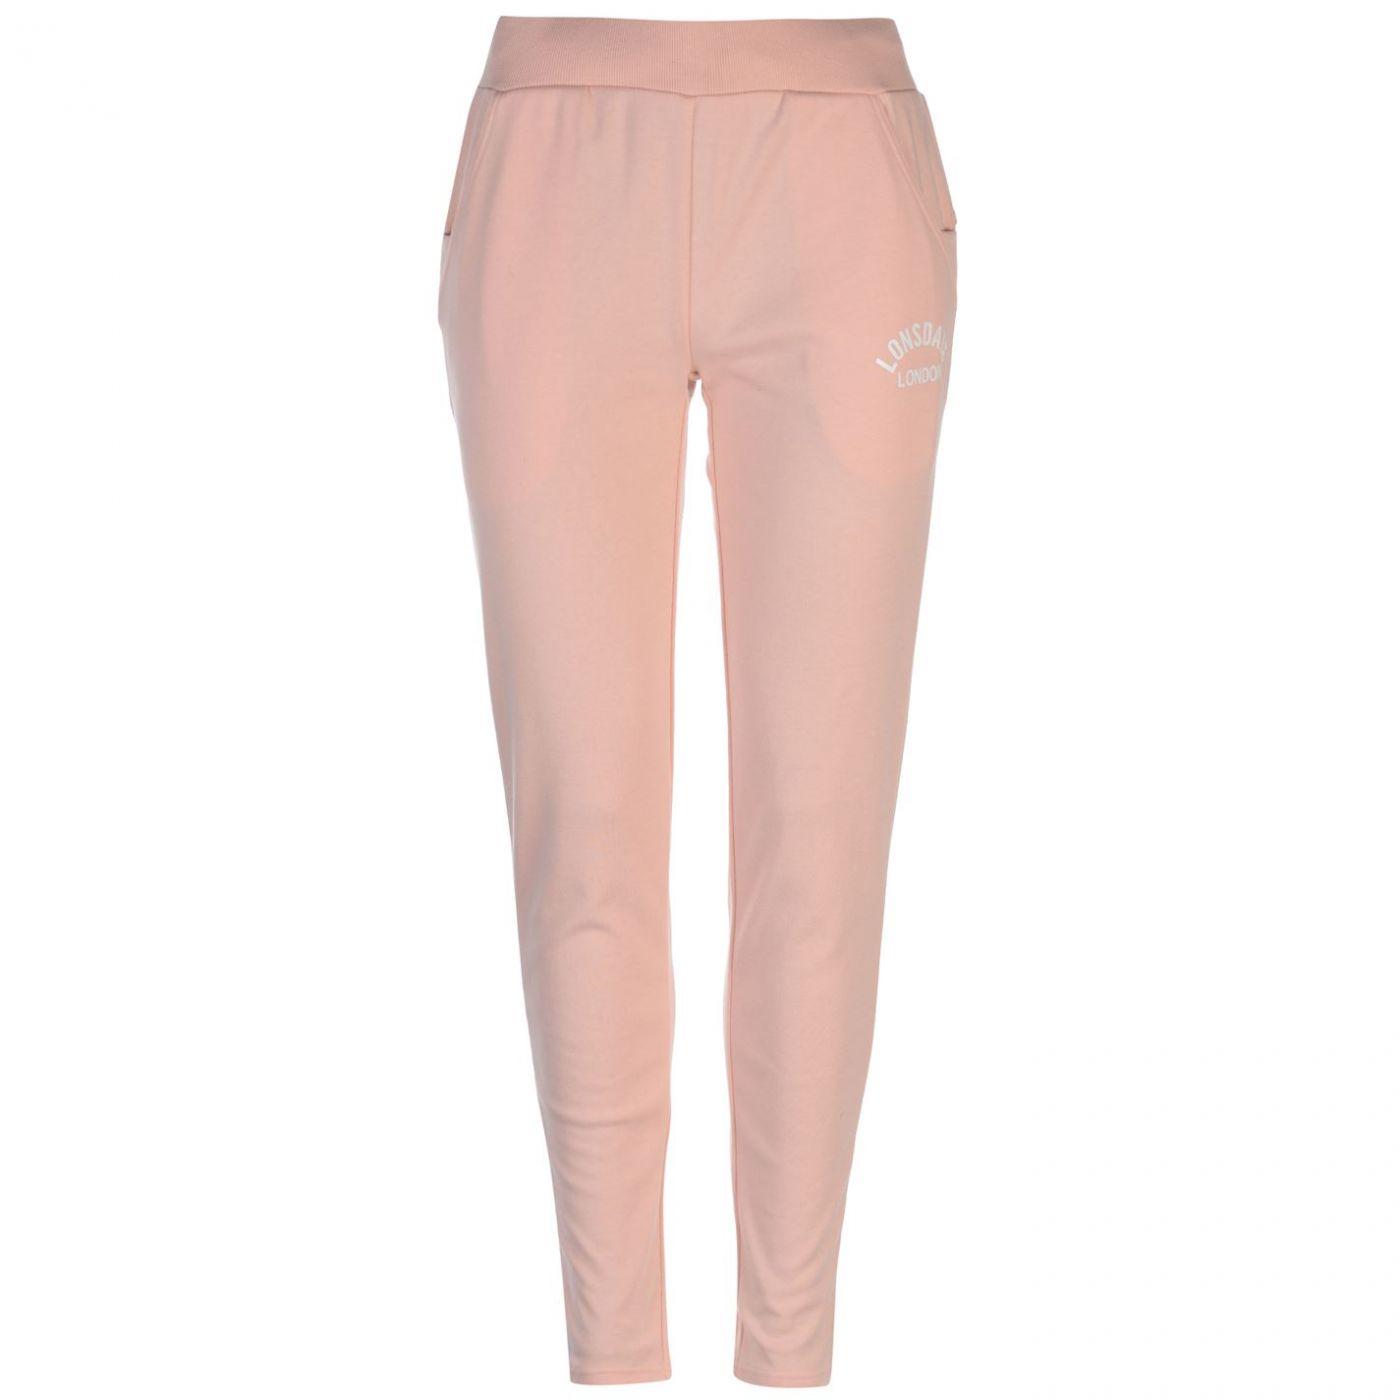 40f0f860e6 Lonsdale Interlock Pants Ladies - FACTCOOL